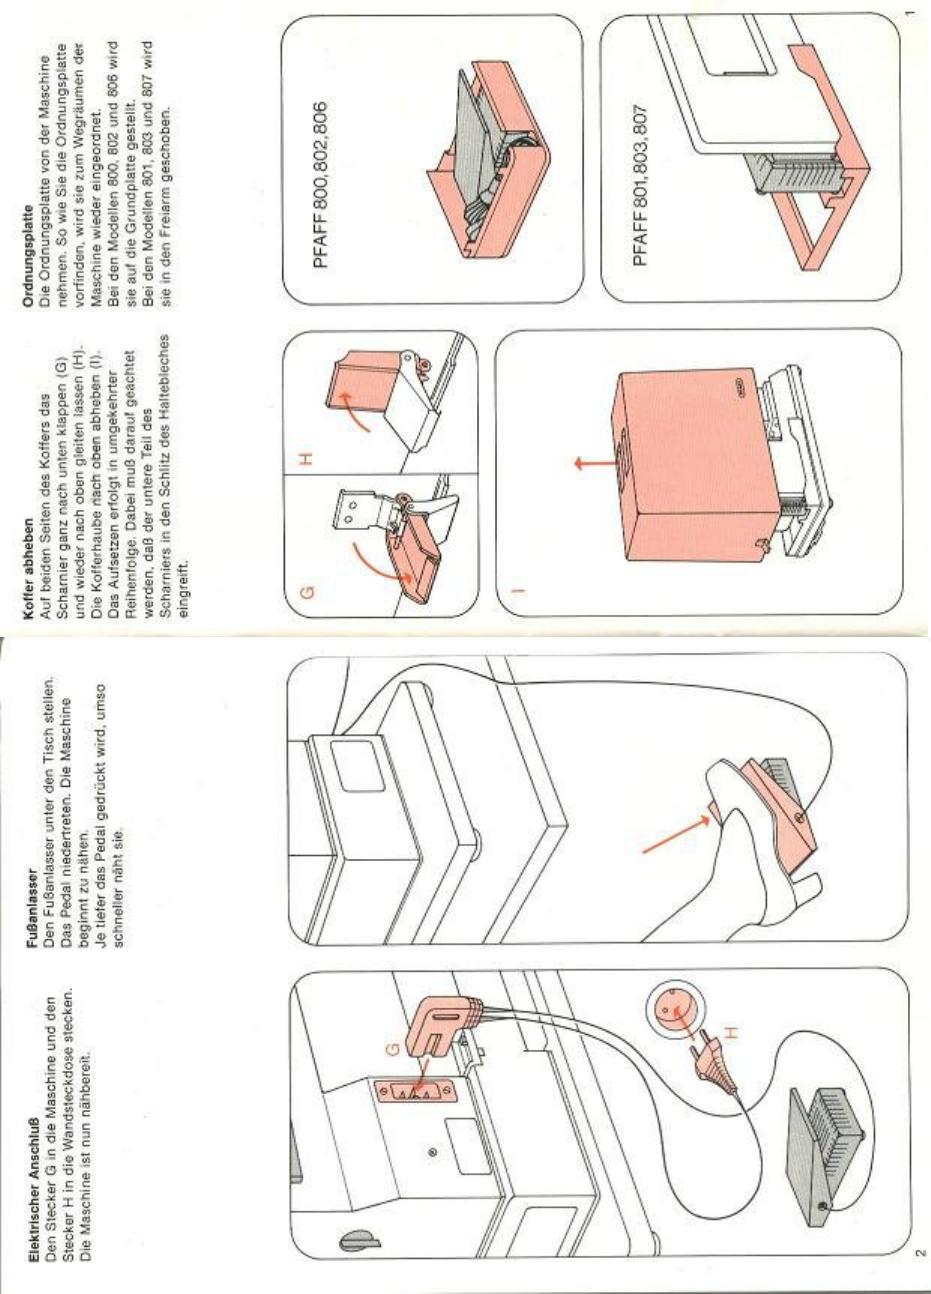 Bedienungsanleitung Pfaff Hobbymatic 803 (Seite 1/13) (1,32 mb ...